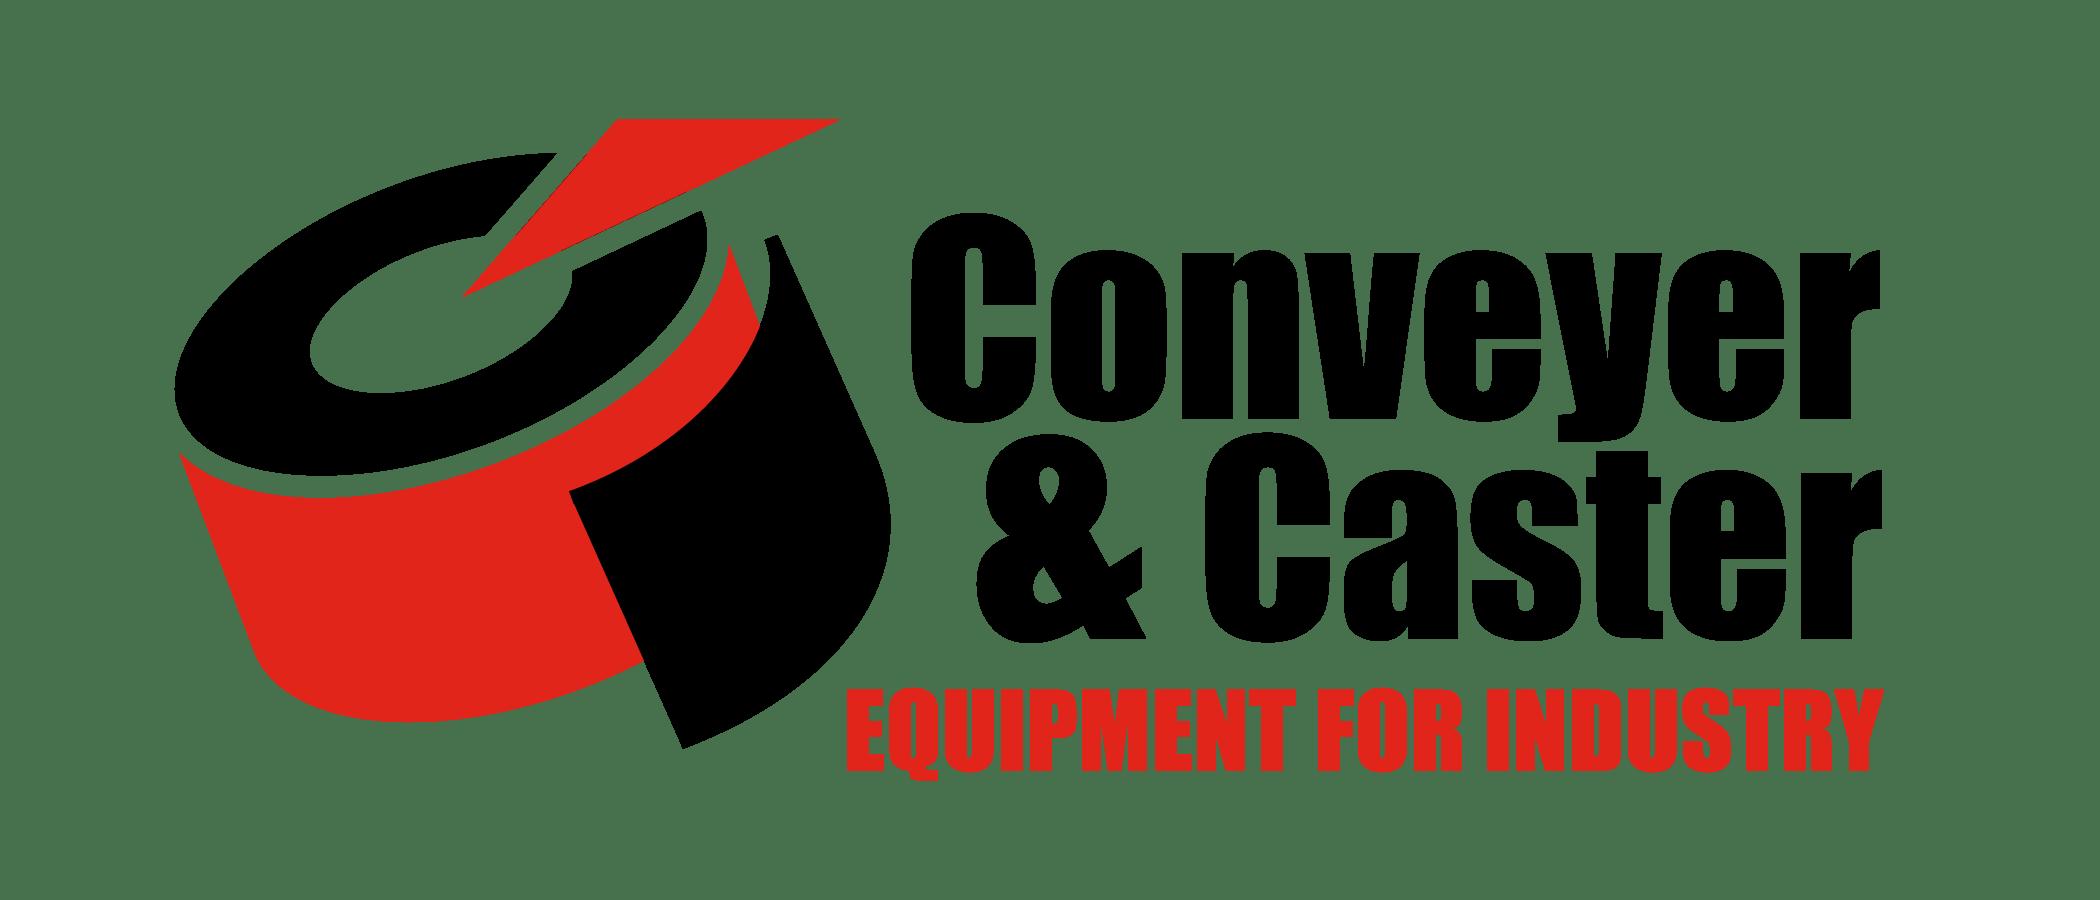 Conveyer & Caster